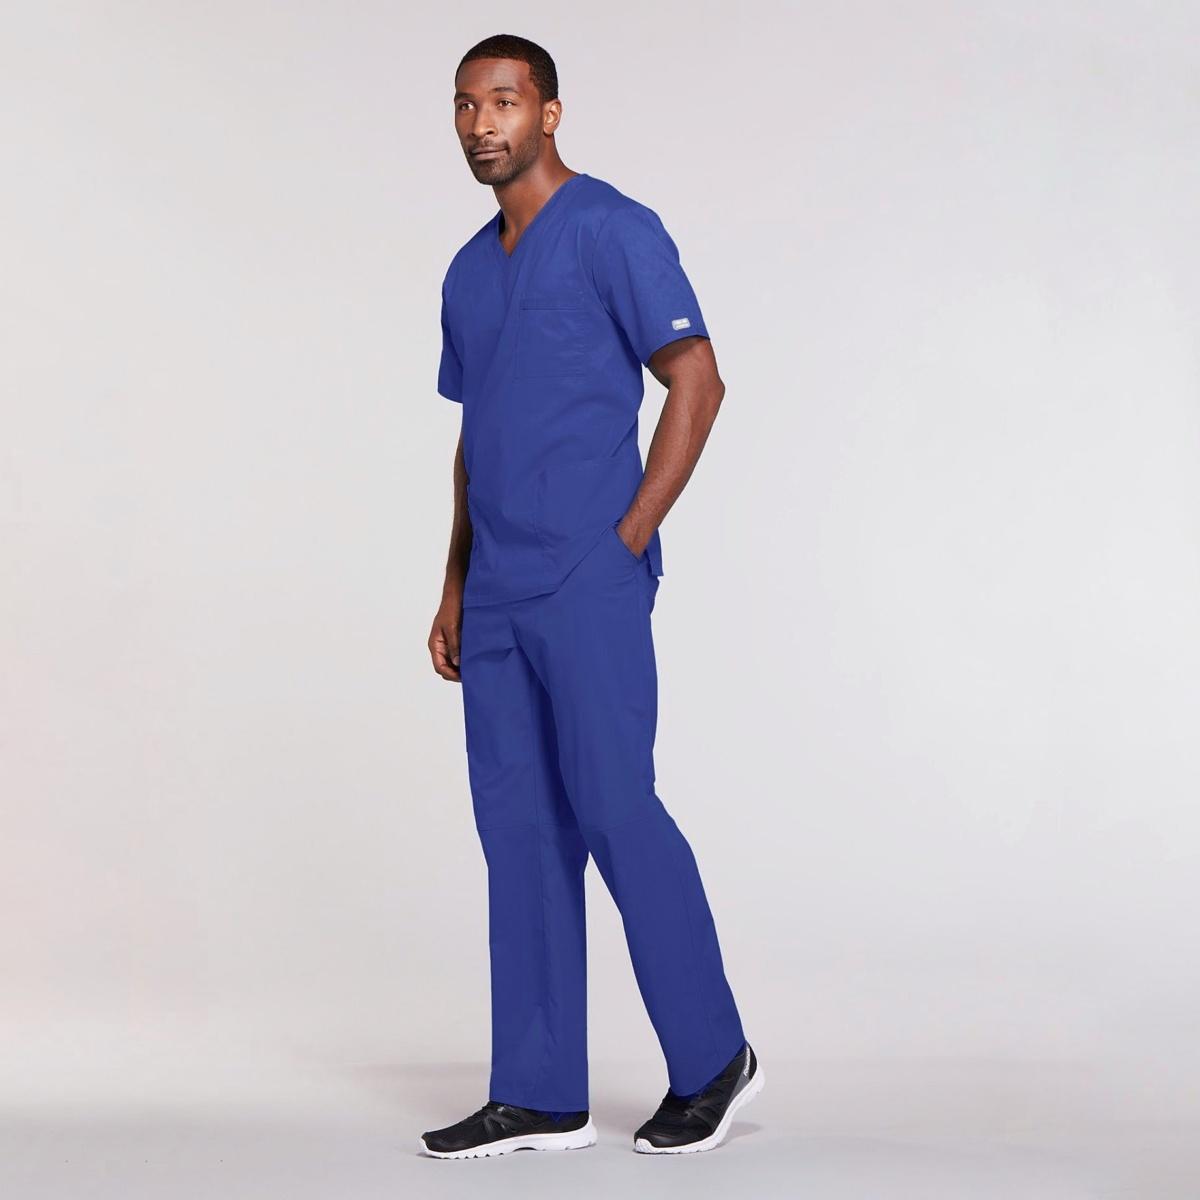 Мужской медицинский костюм прямого силуэта Core Stretch цвет- виноград